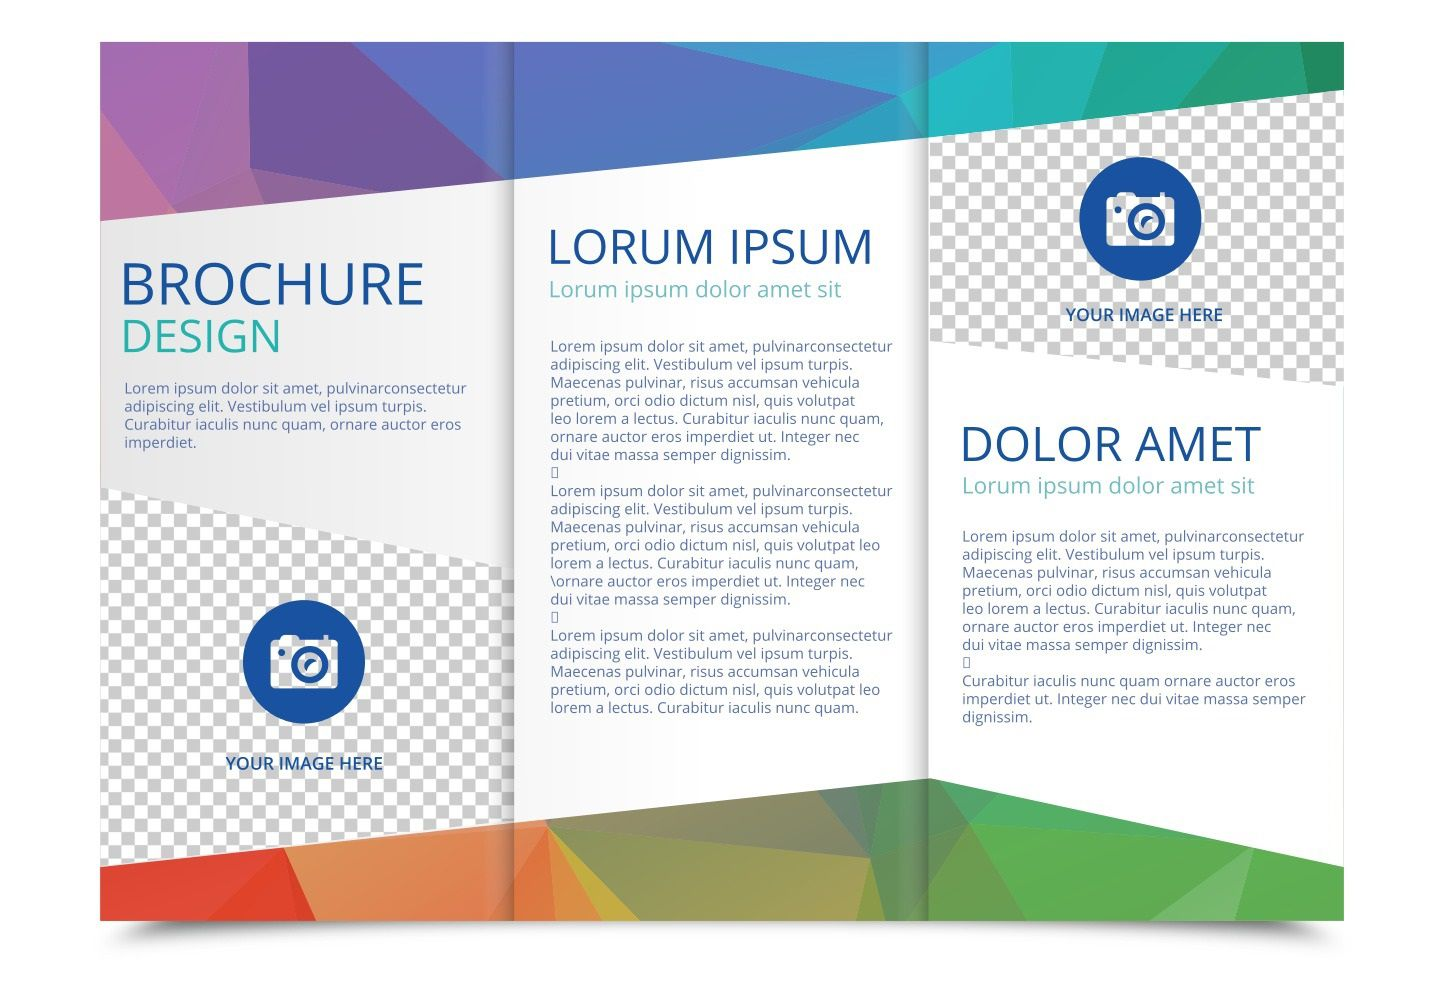 005 Stirring Free Tri Fold Brochure Template Sample  Photoshop Illustrator Microsoft Word 2010Full